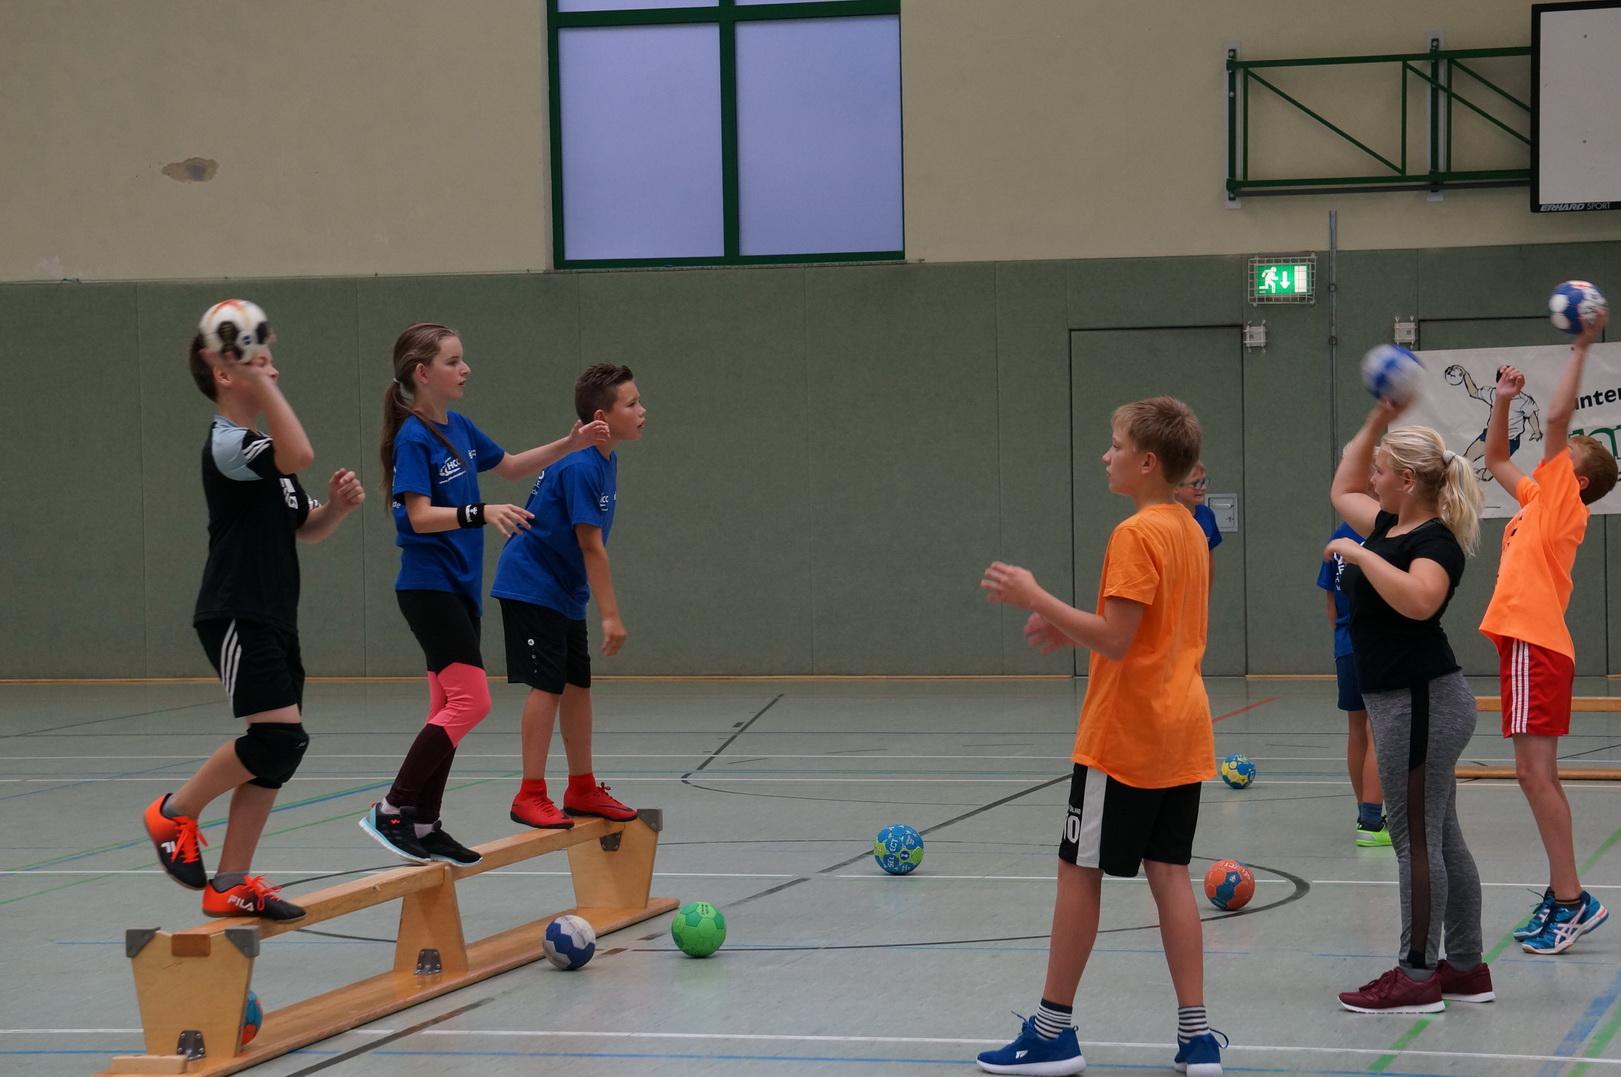 201808_Handballcamp_SDH_MG_172w